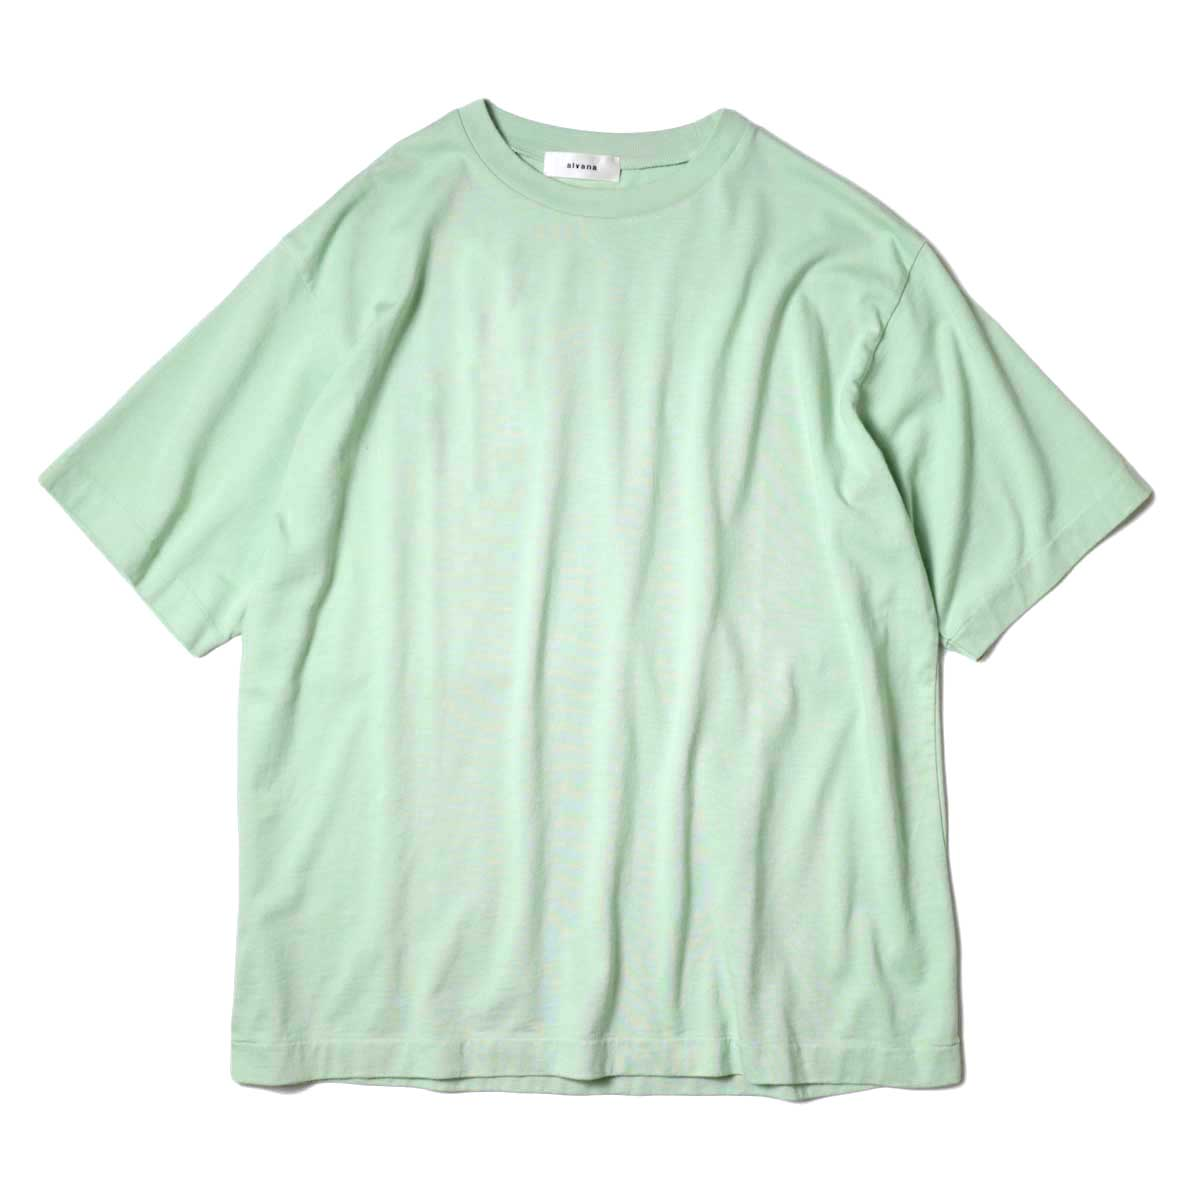 alvana / Dairy Oversize Tee Shirts (Forest Green)